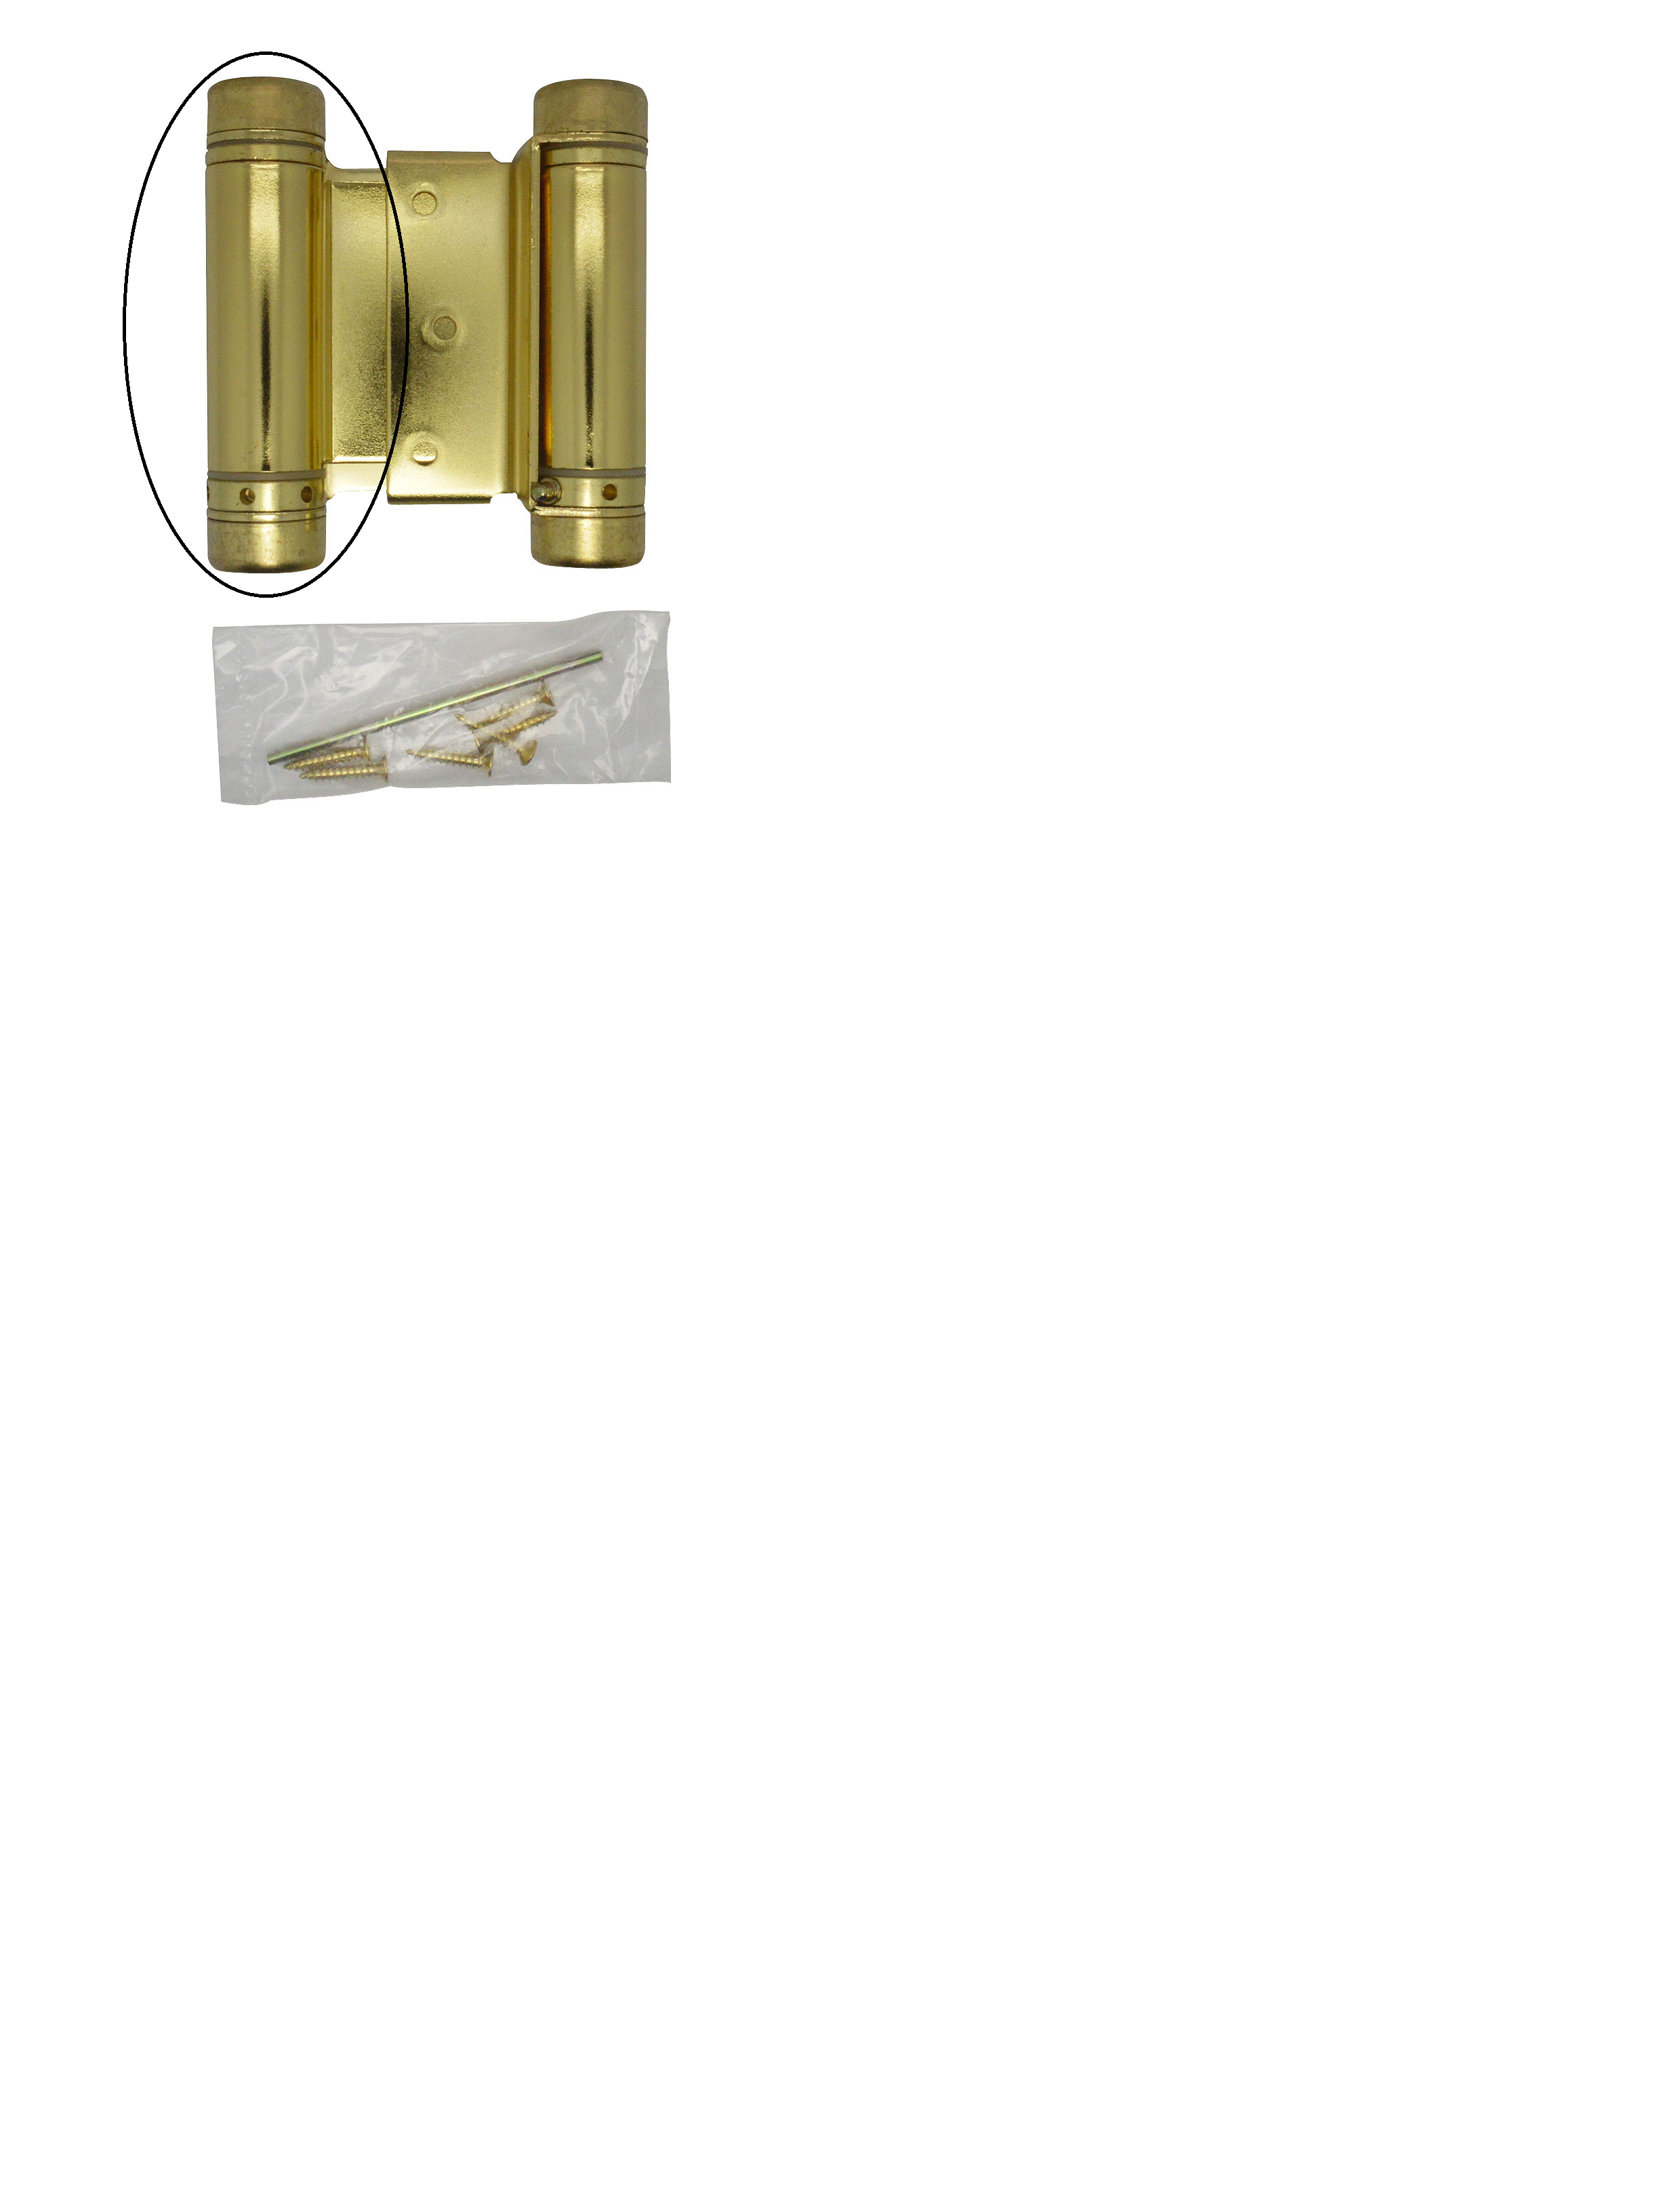 Brass Spring Hinge